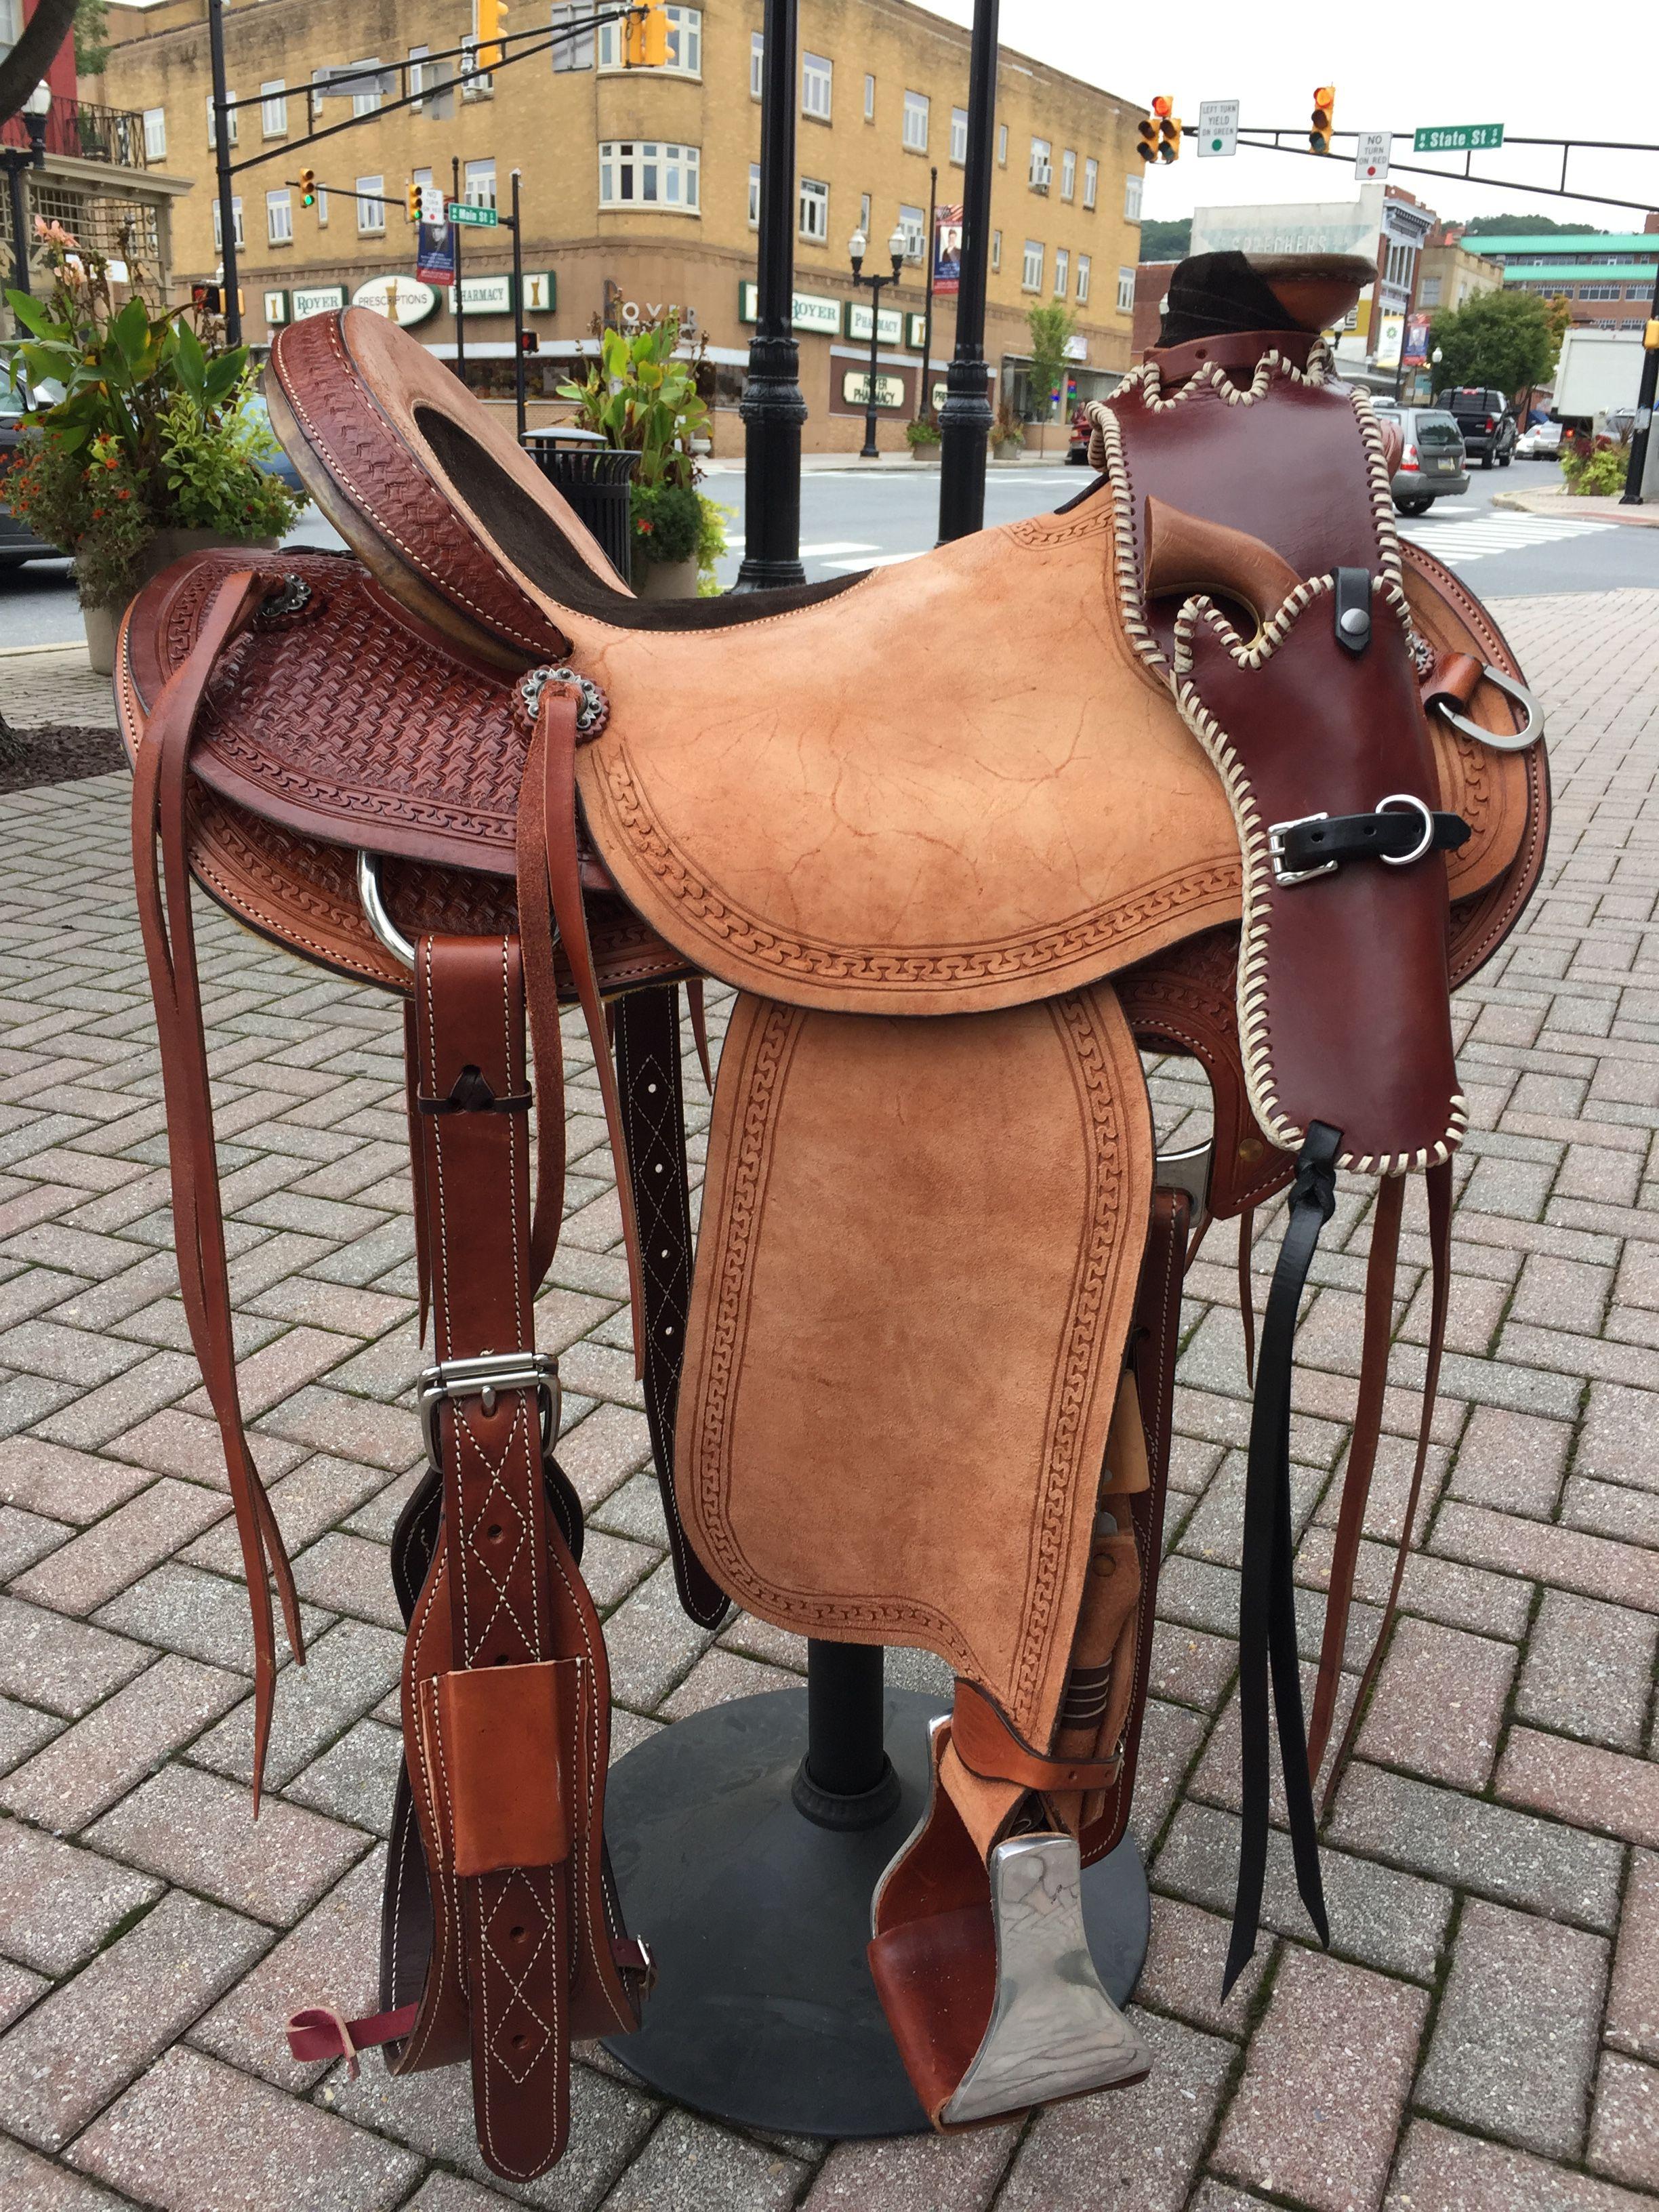 Wade Saddle Horn Holster By Fx Saddle Company Wade Saddles Horse Show Clothes Saddles